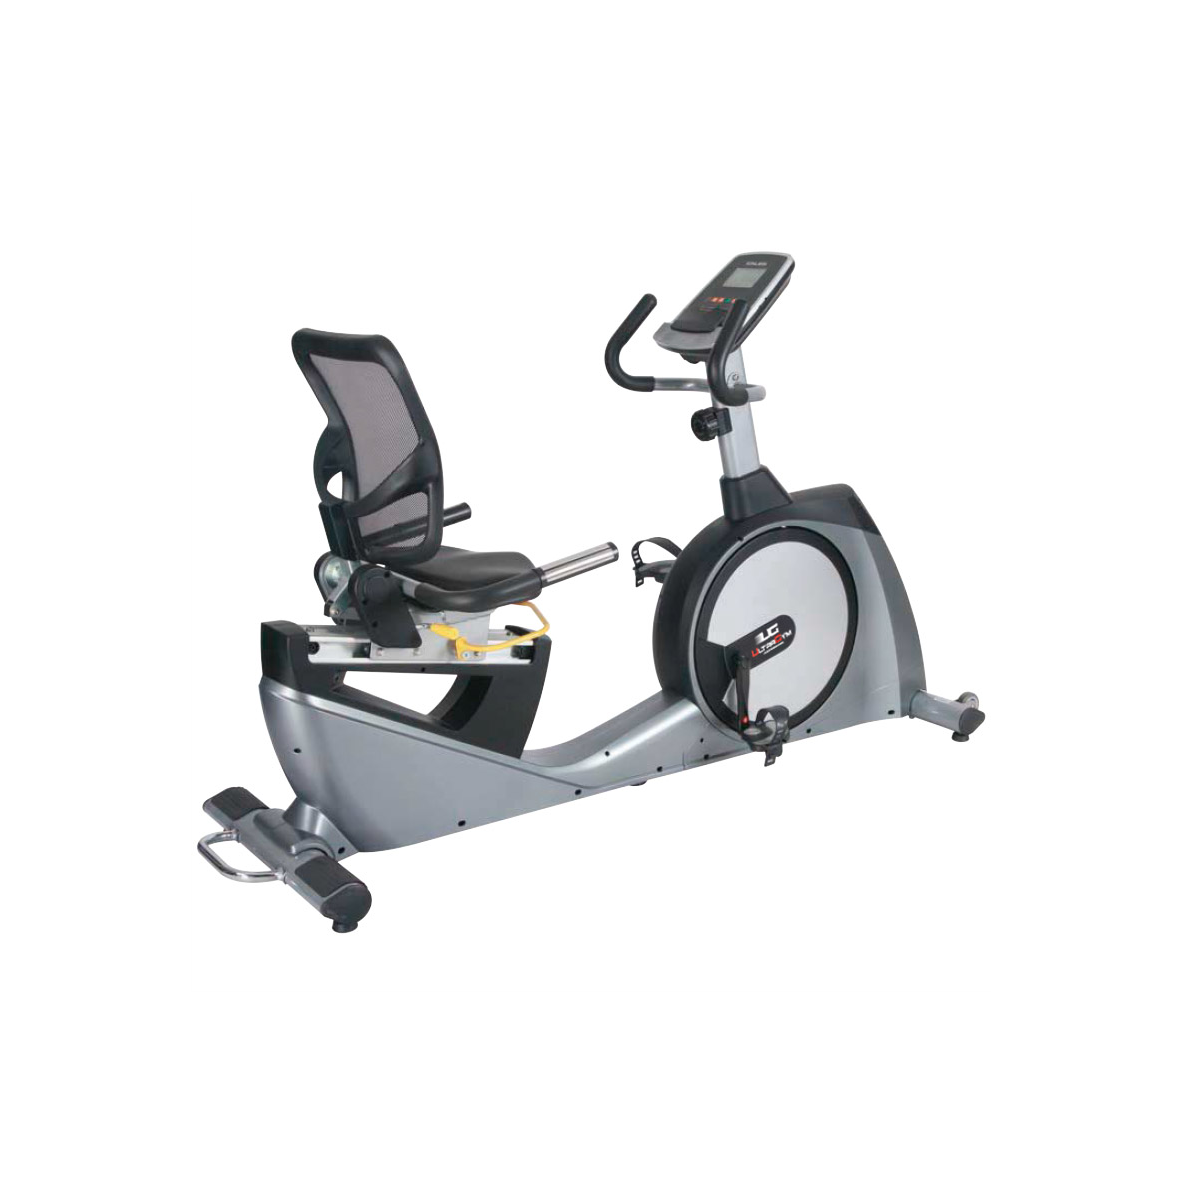 Велотренажер UG-B003/2 UG-B003/2 по цене 89 900